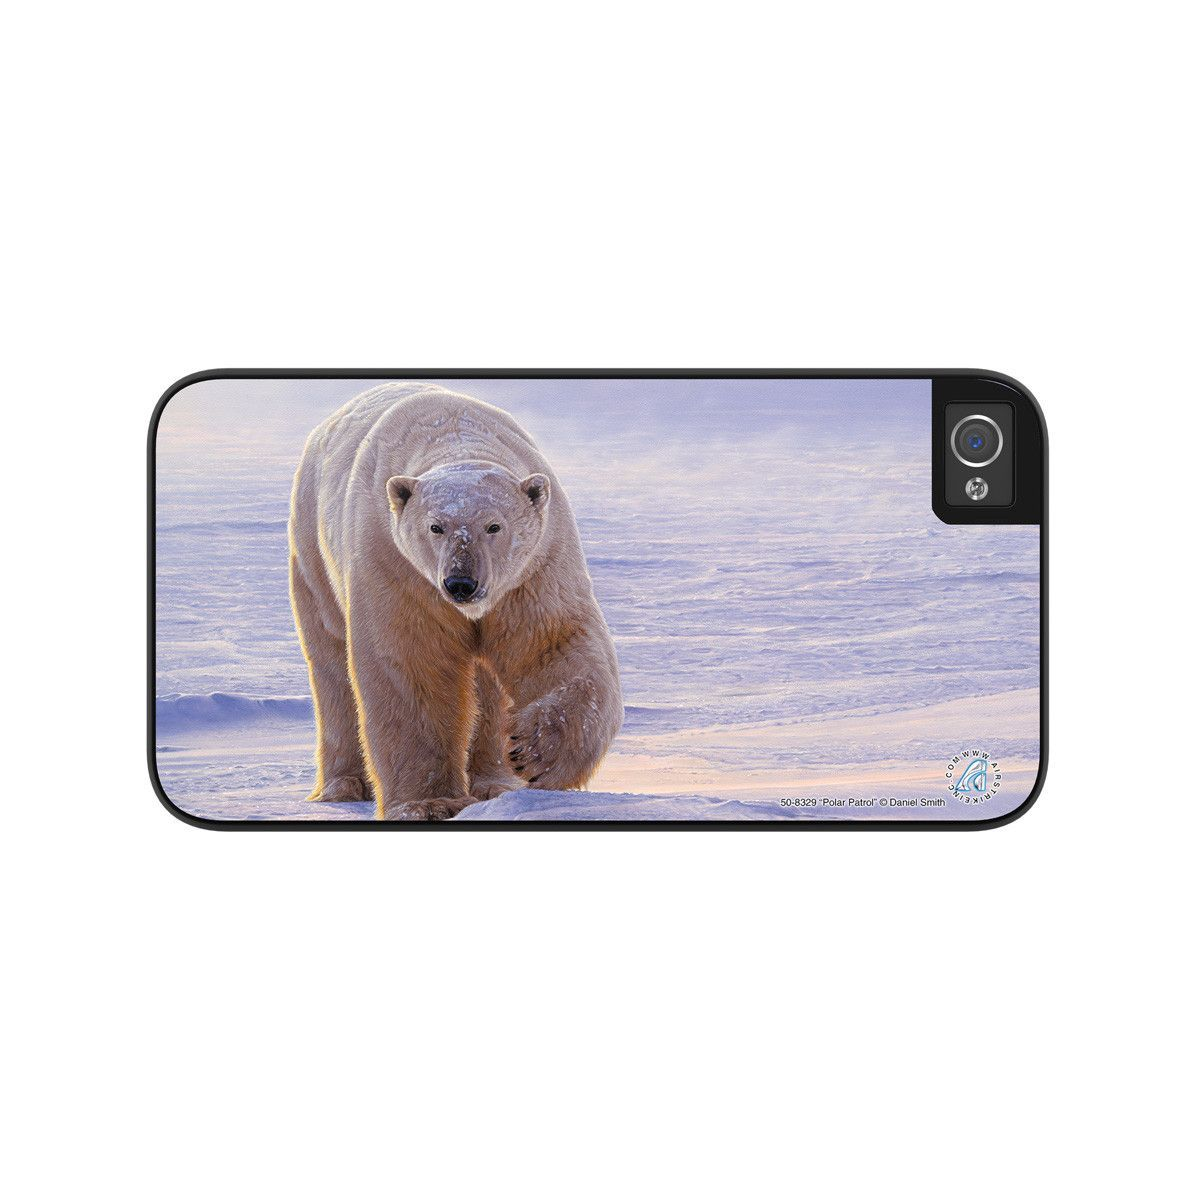 "Airstrike® Polar Bear iPhone 5 Case, Polar Bear iPhone 5s Case, Polar Bear iPhone Case Protective Polar Bear Phone Case ""Polar Patrol"" 50-8329"